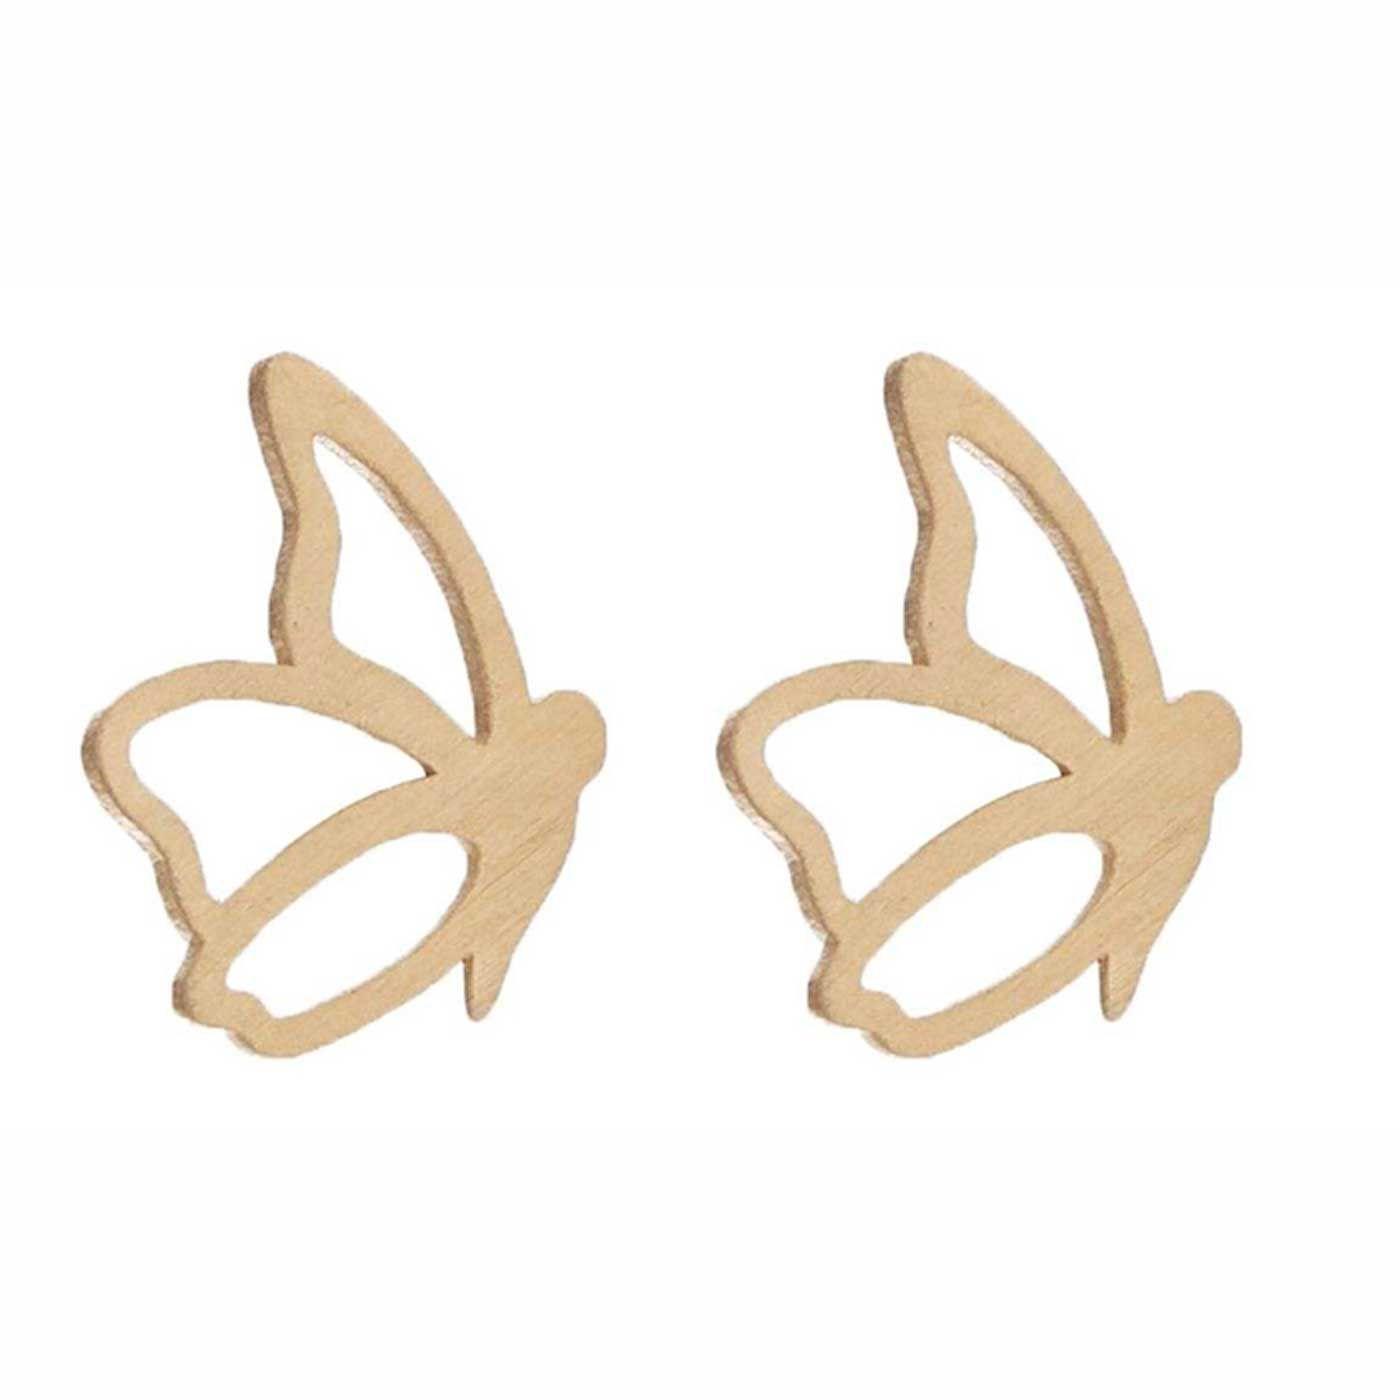 گوشواره طلا 18 عیار زنانه کانیار گالری کد GOA96 -  - 4